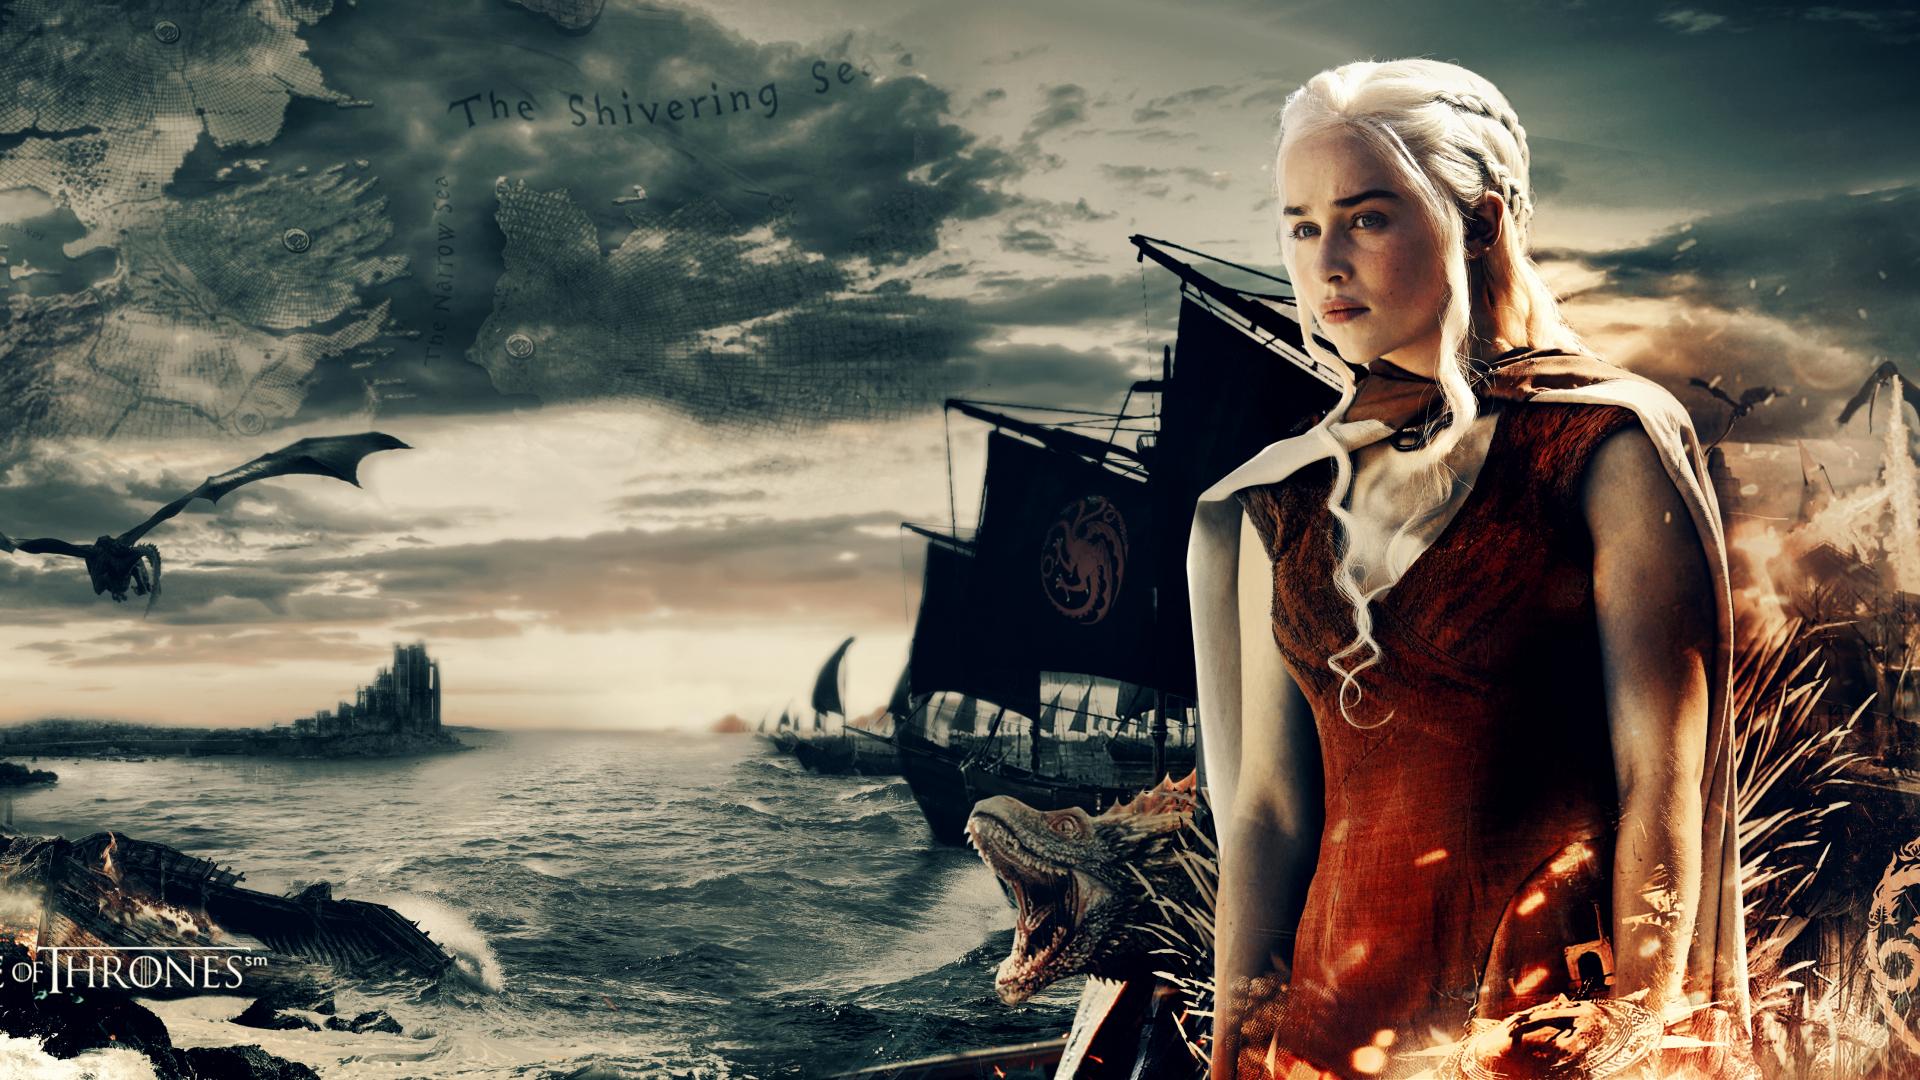 Free Download 155 4k Ultra Hd Daenerys Targaryen Wallpapers